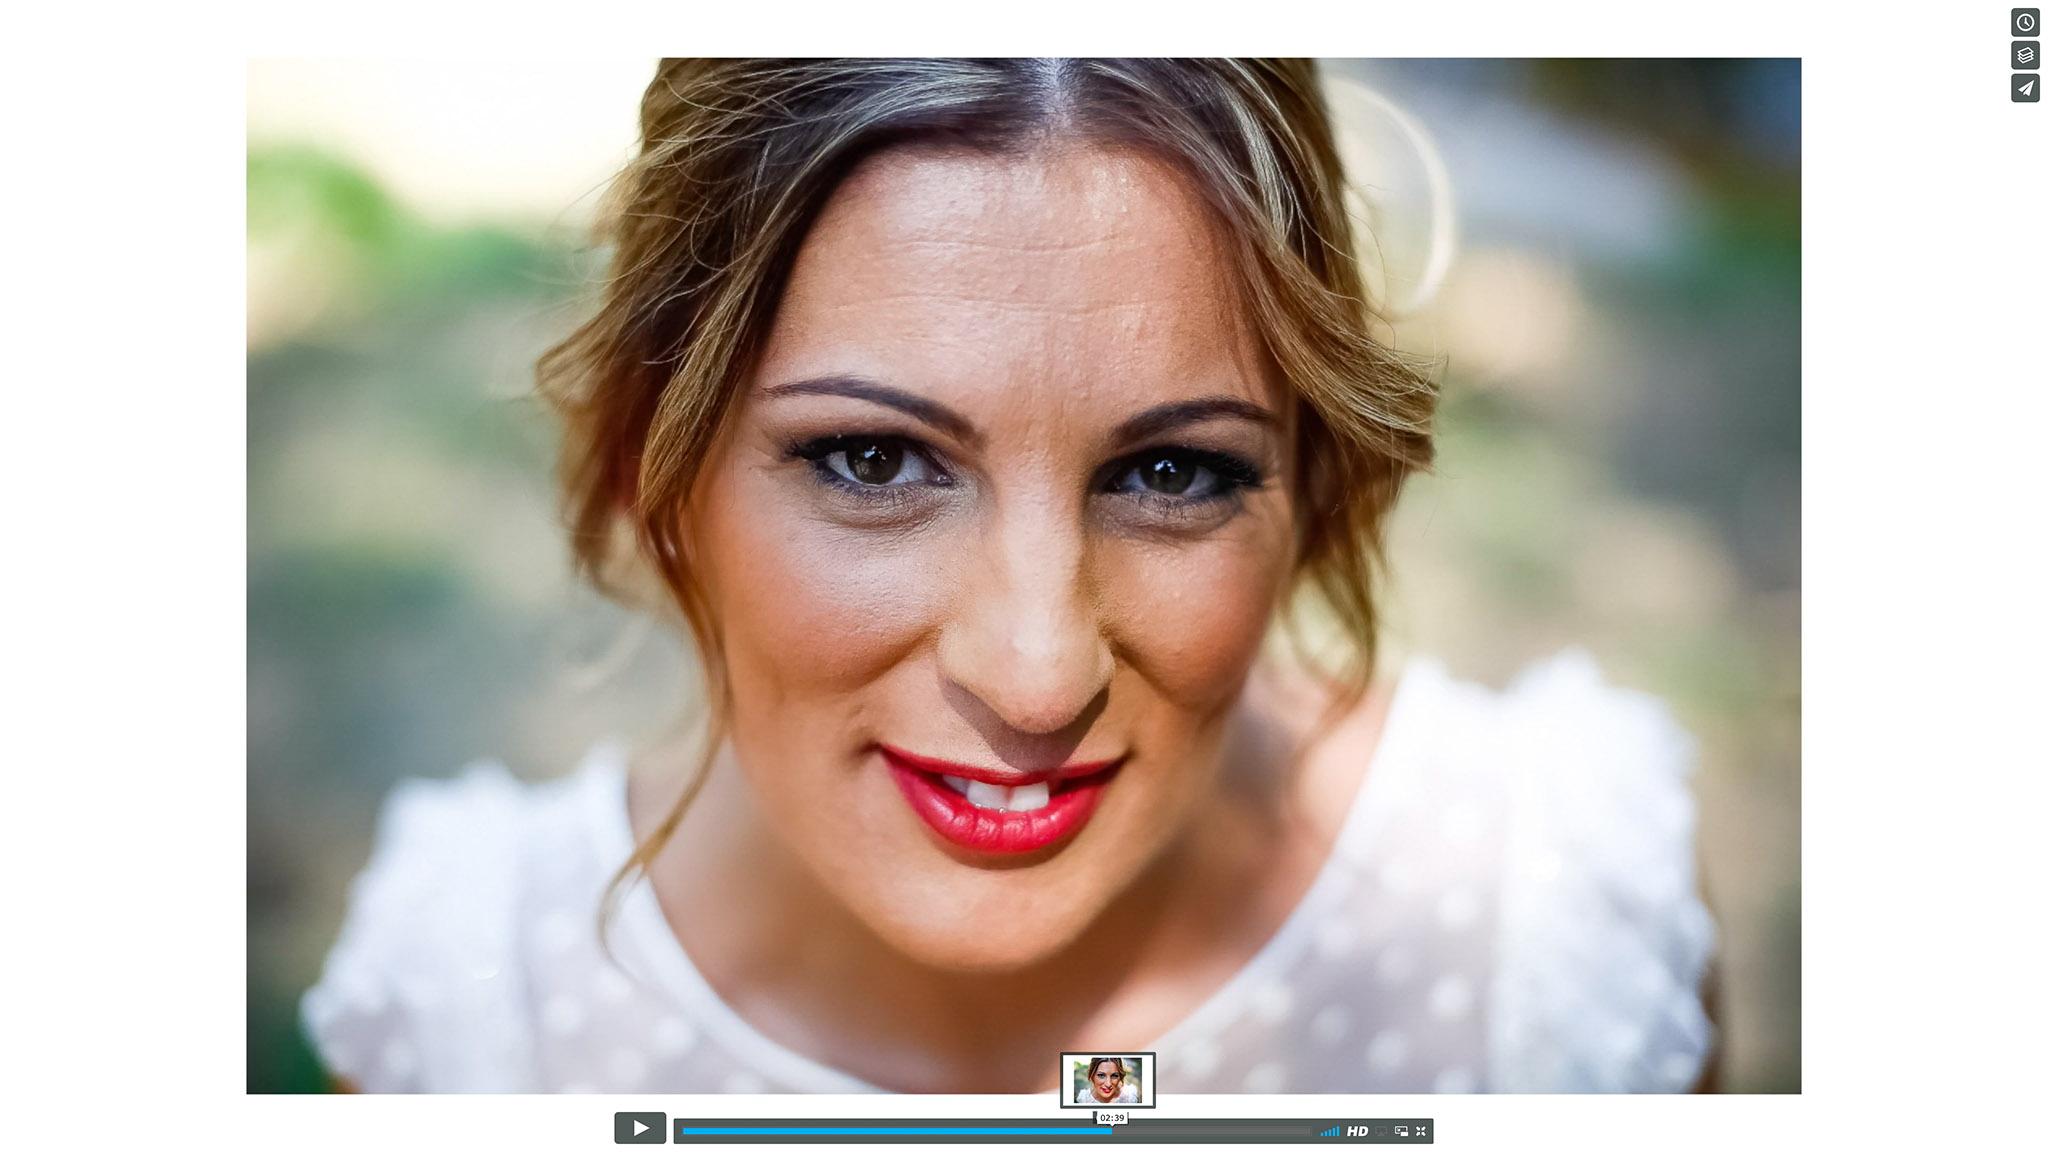 Same Day Edit - Captura de pantalla de los fotógrafos de boda Notblank de Tui.